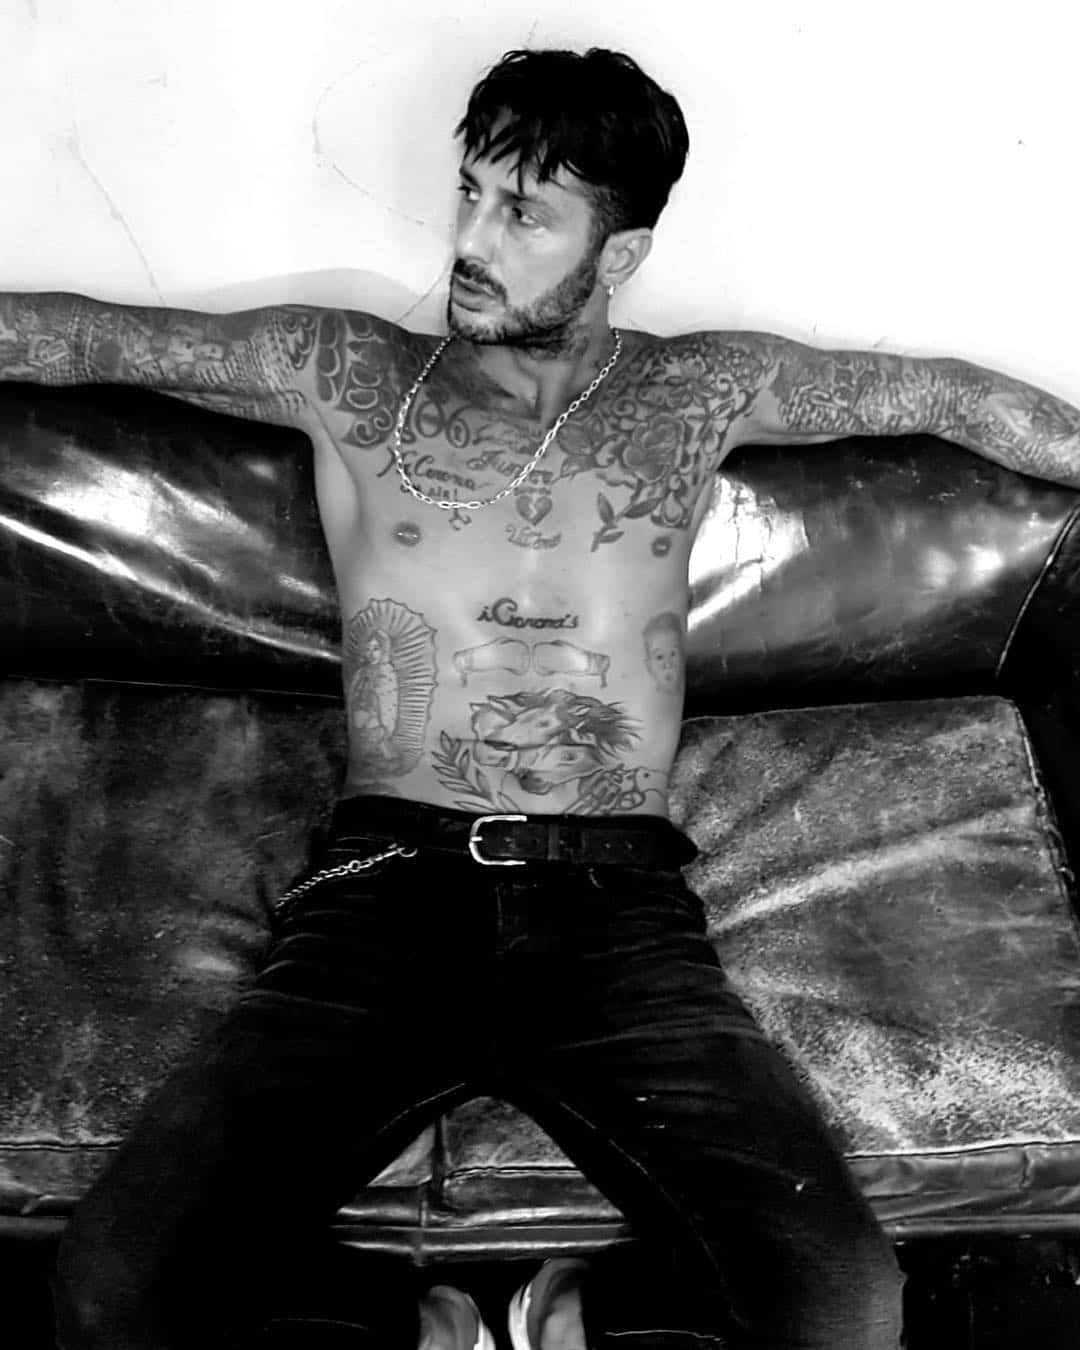 Corona tatuaggi photocredit @fabriziocoronareal